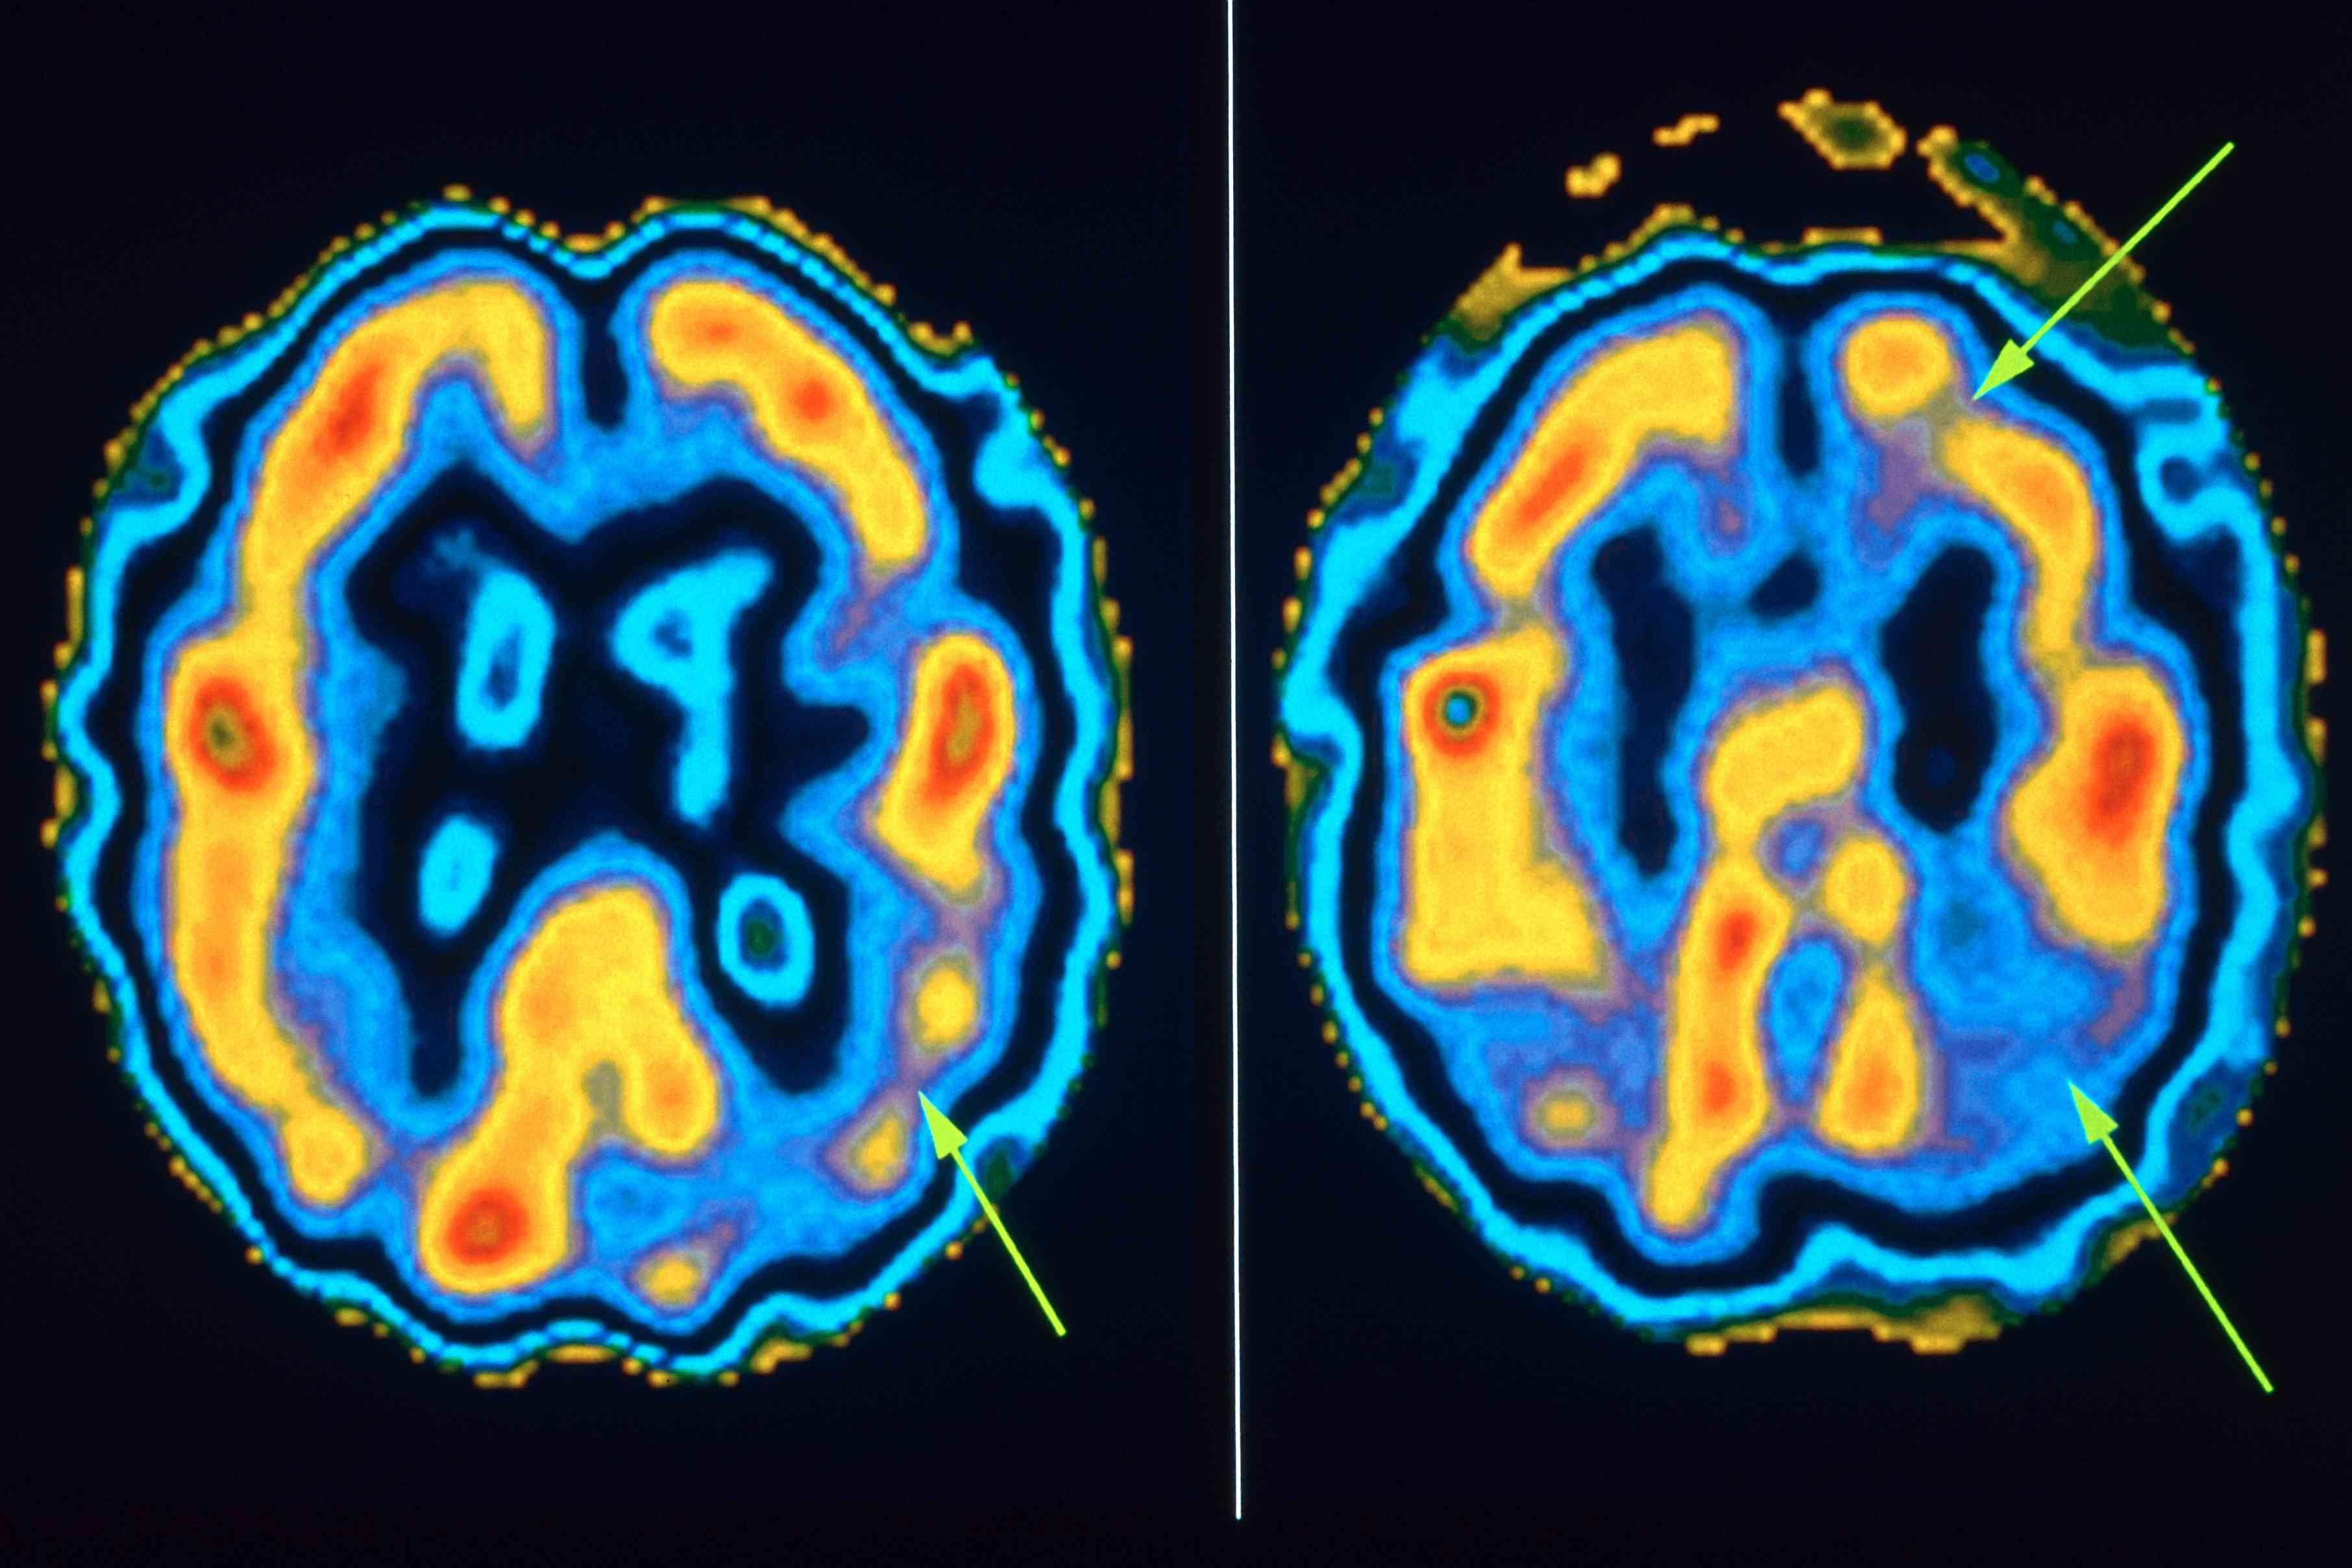 Medical imaging of progression of Alzheimer's in brain